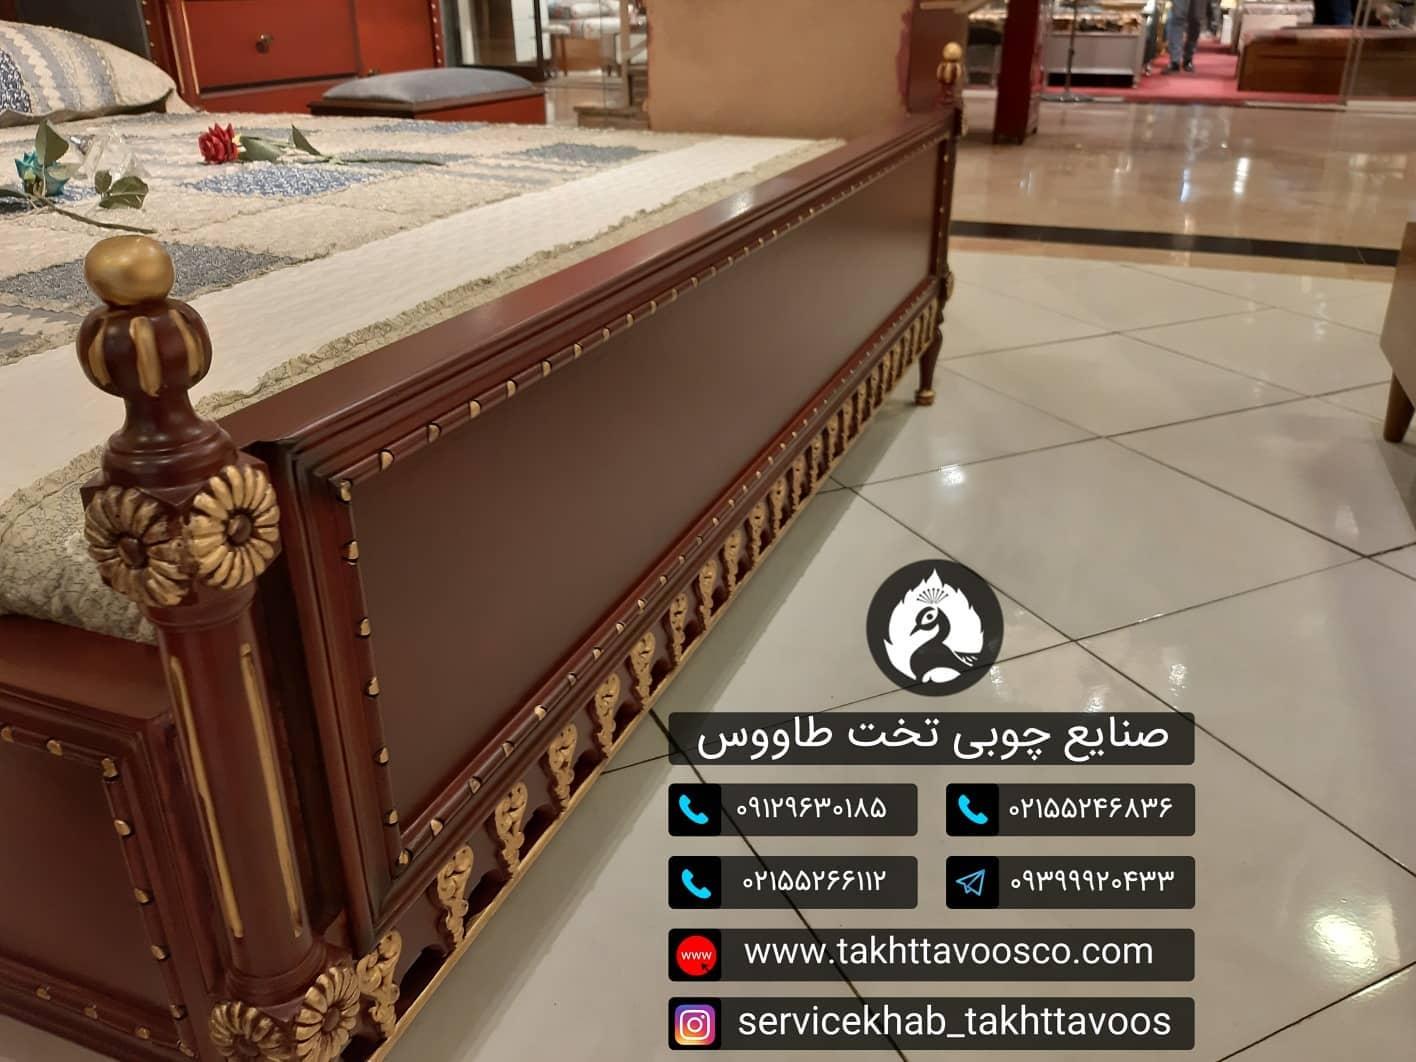 servicekhab_takhttavoos-20210920-0039